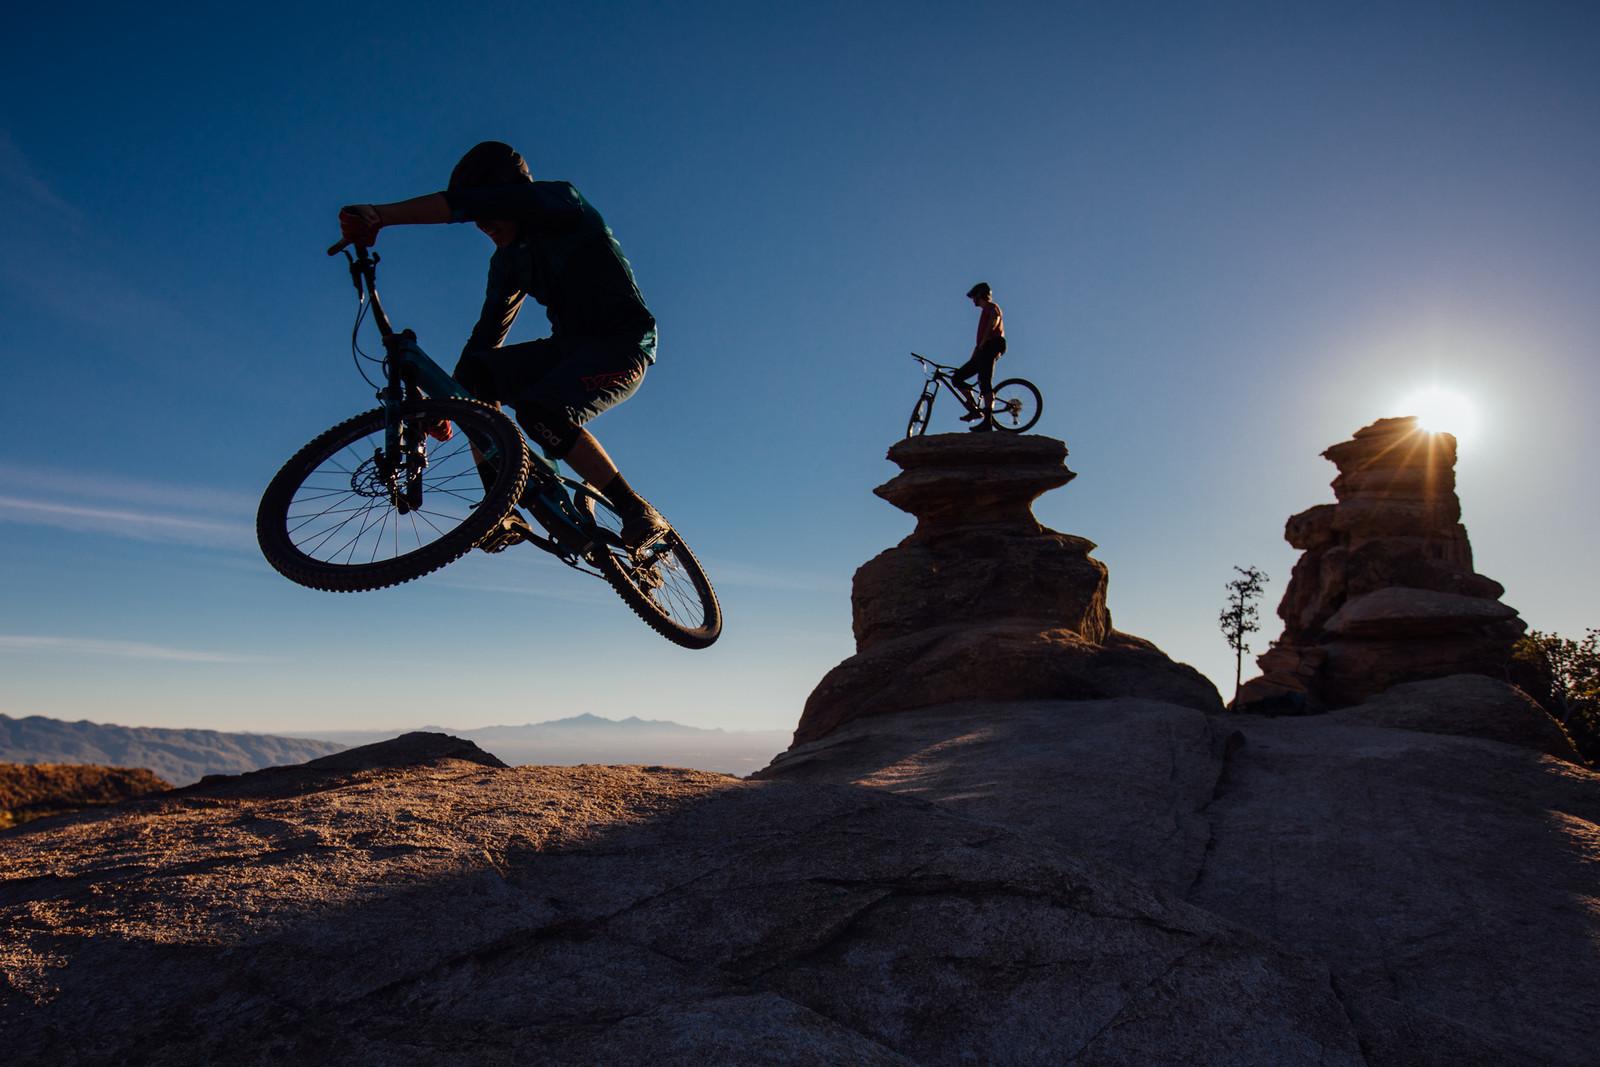 Just The Bangers - 2017 Vital MTB Test Sessions Photo Gallery - Just The Bangers - 2017 Vital MTB Test Sessions Photo Gallery - Mountain Biking Pictures - Vital MTB